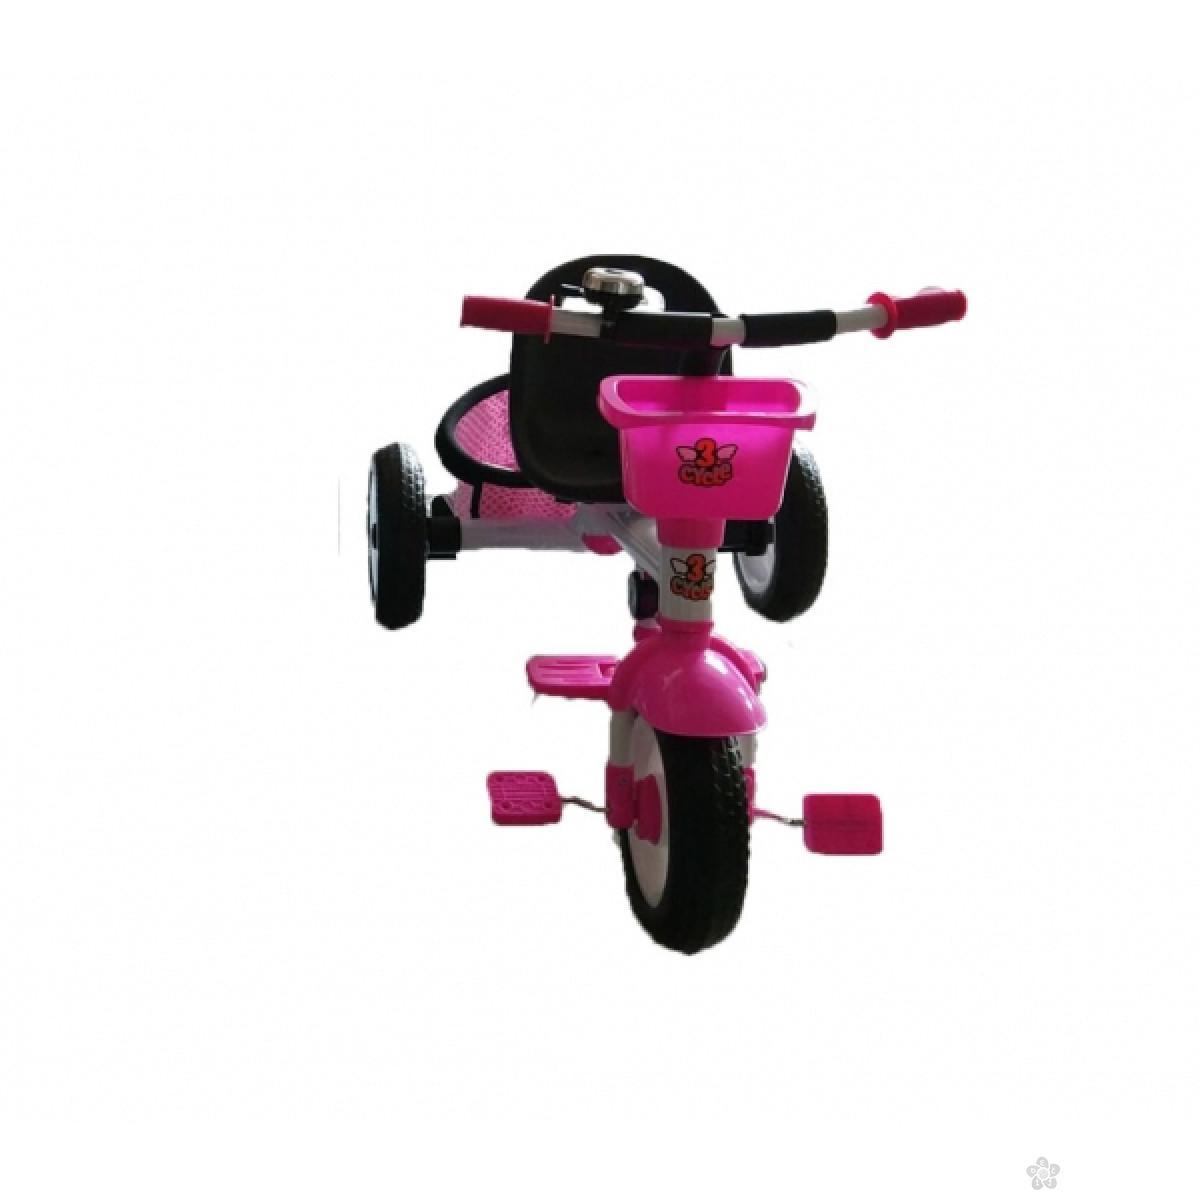 Tricikl 3 Cycle mini, 6890104, rozi